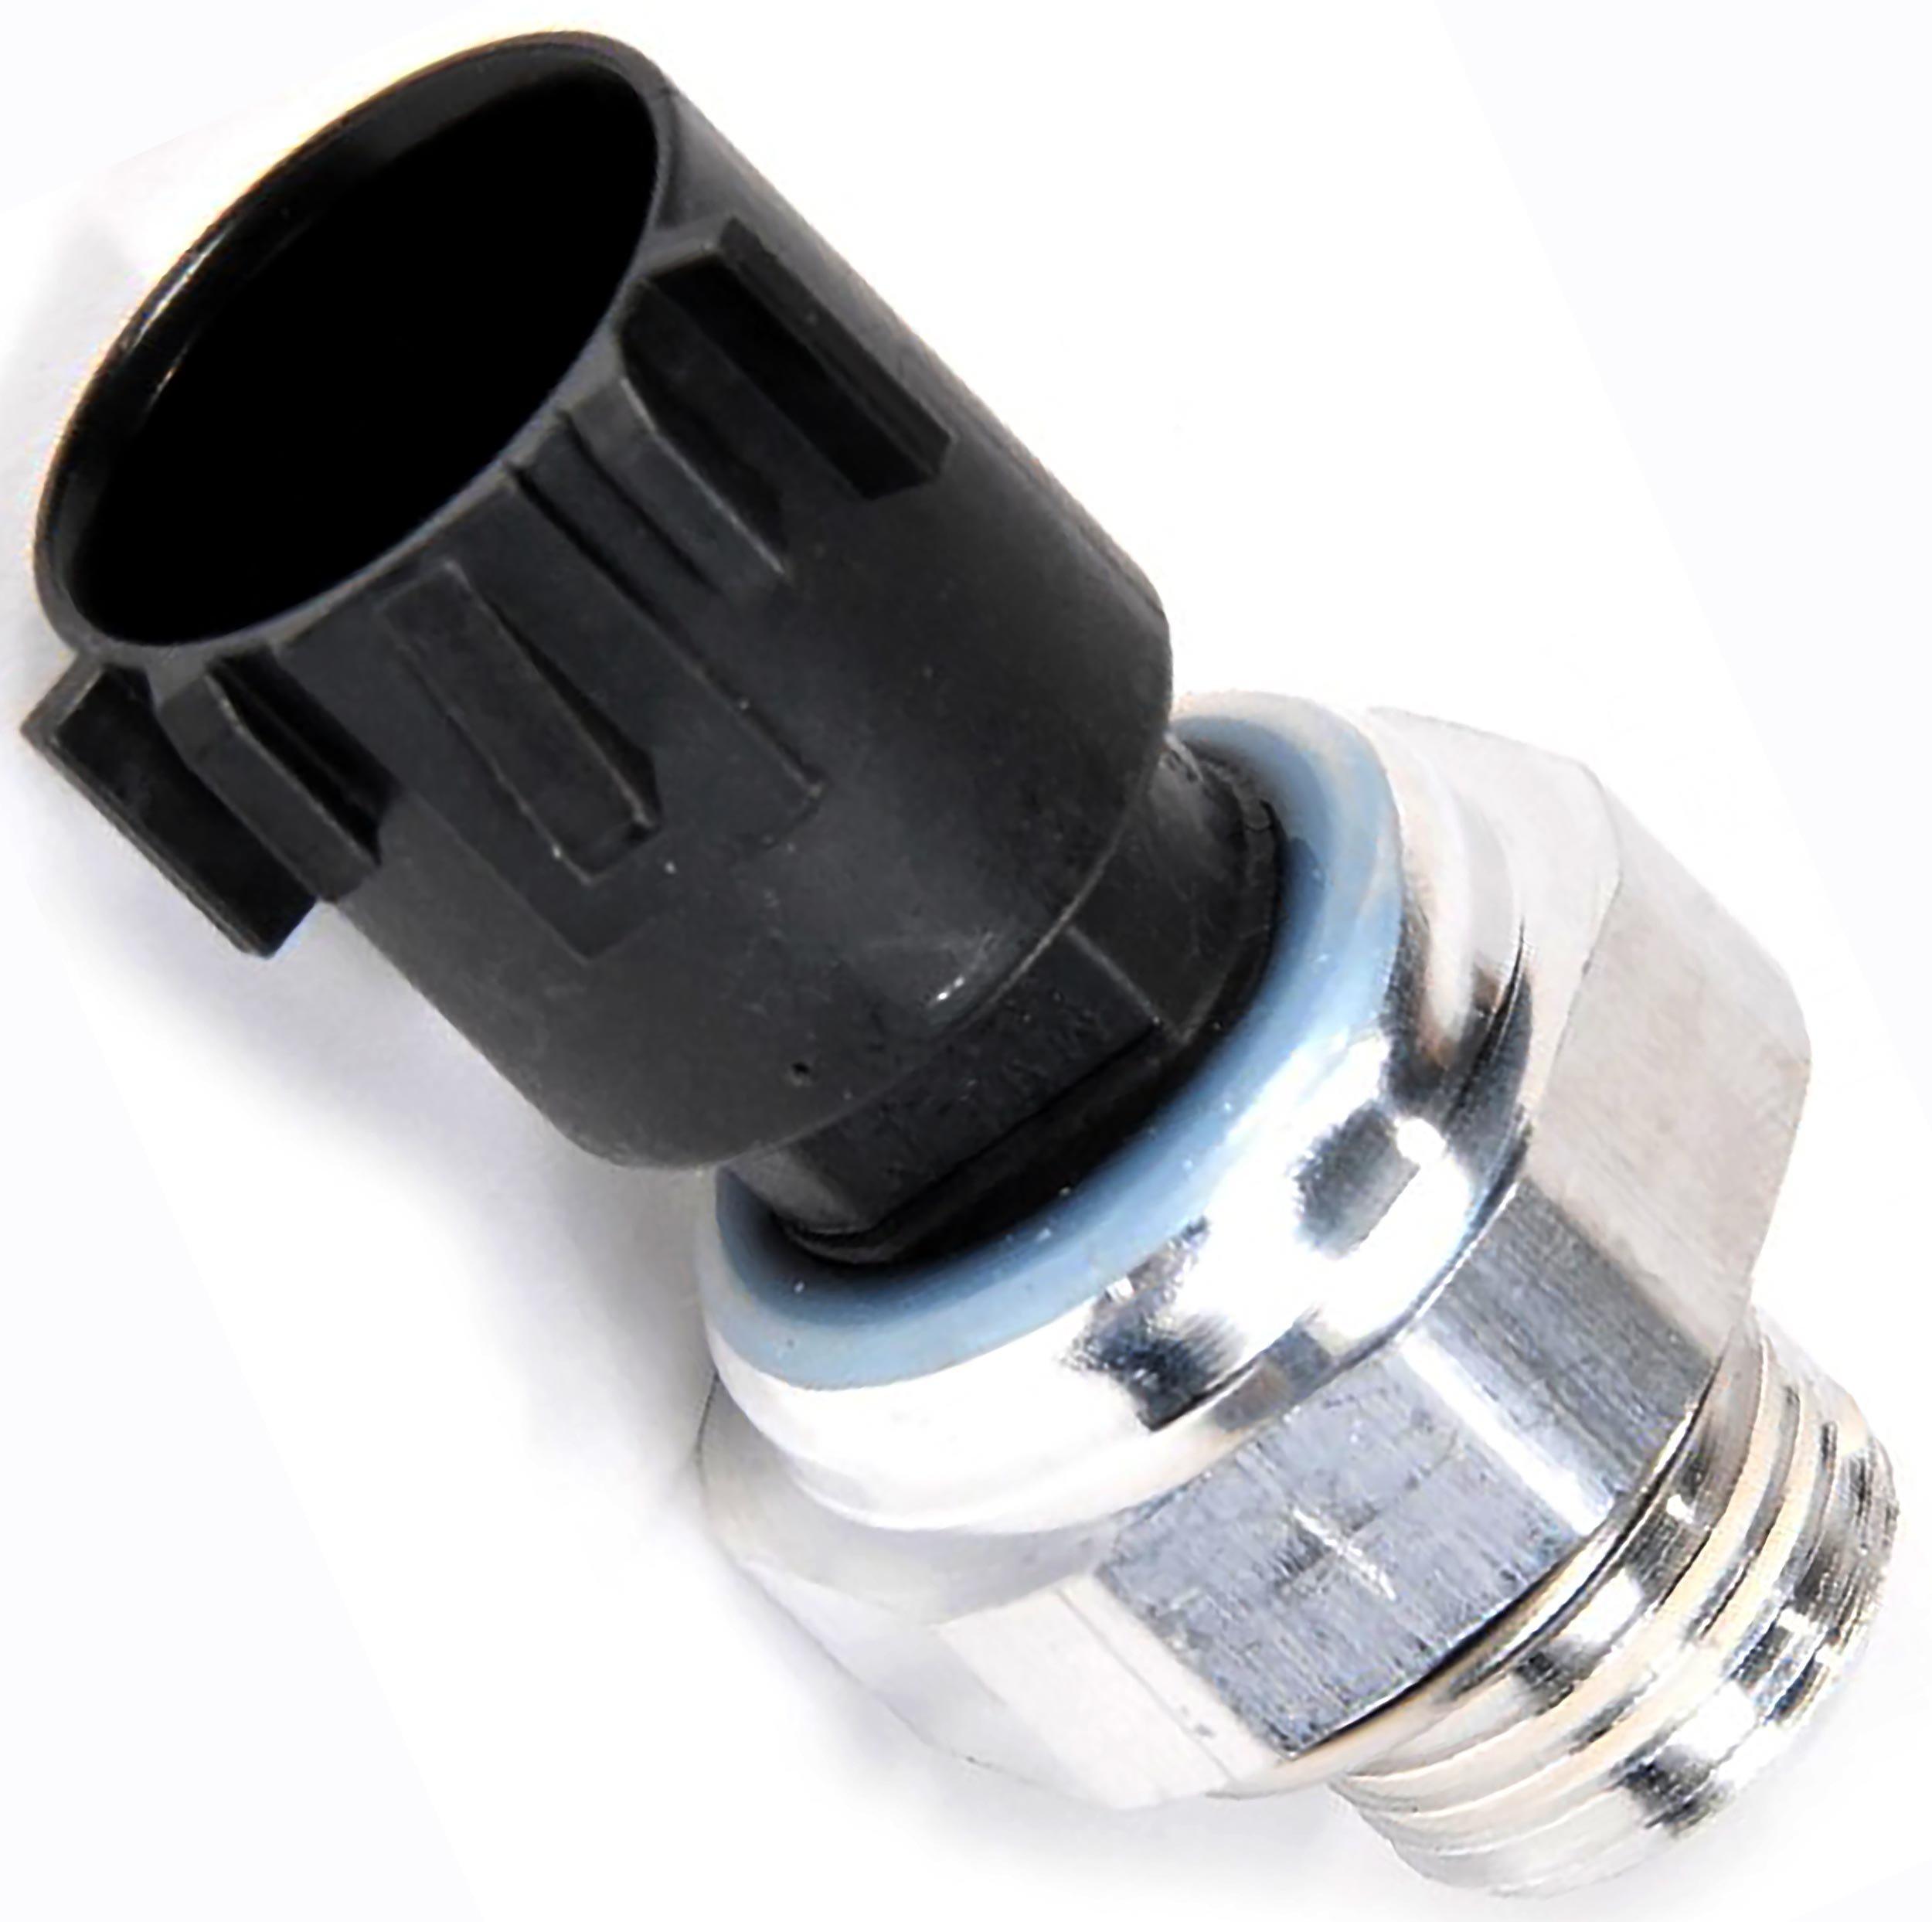 APDTY 133896 Engine Oil Pressure Sensor Switch 12673134, 12621234, 213-4411 (Typically Solves DTC Diagnostic Trouble Code PO520, PO521, PO522, PO523, PO524) by APDTY